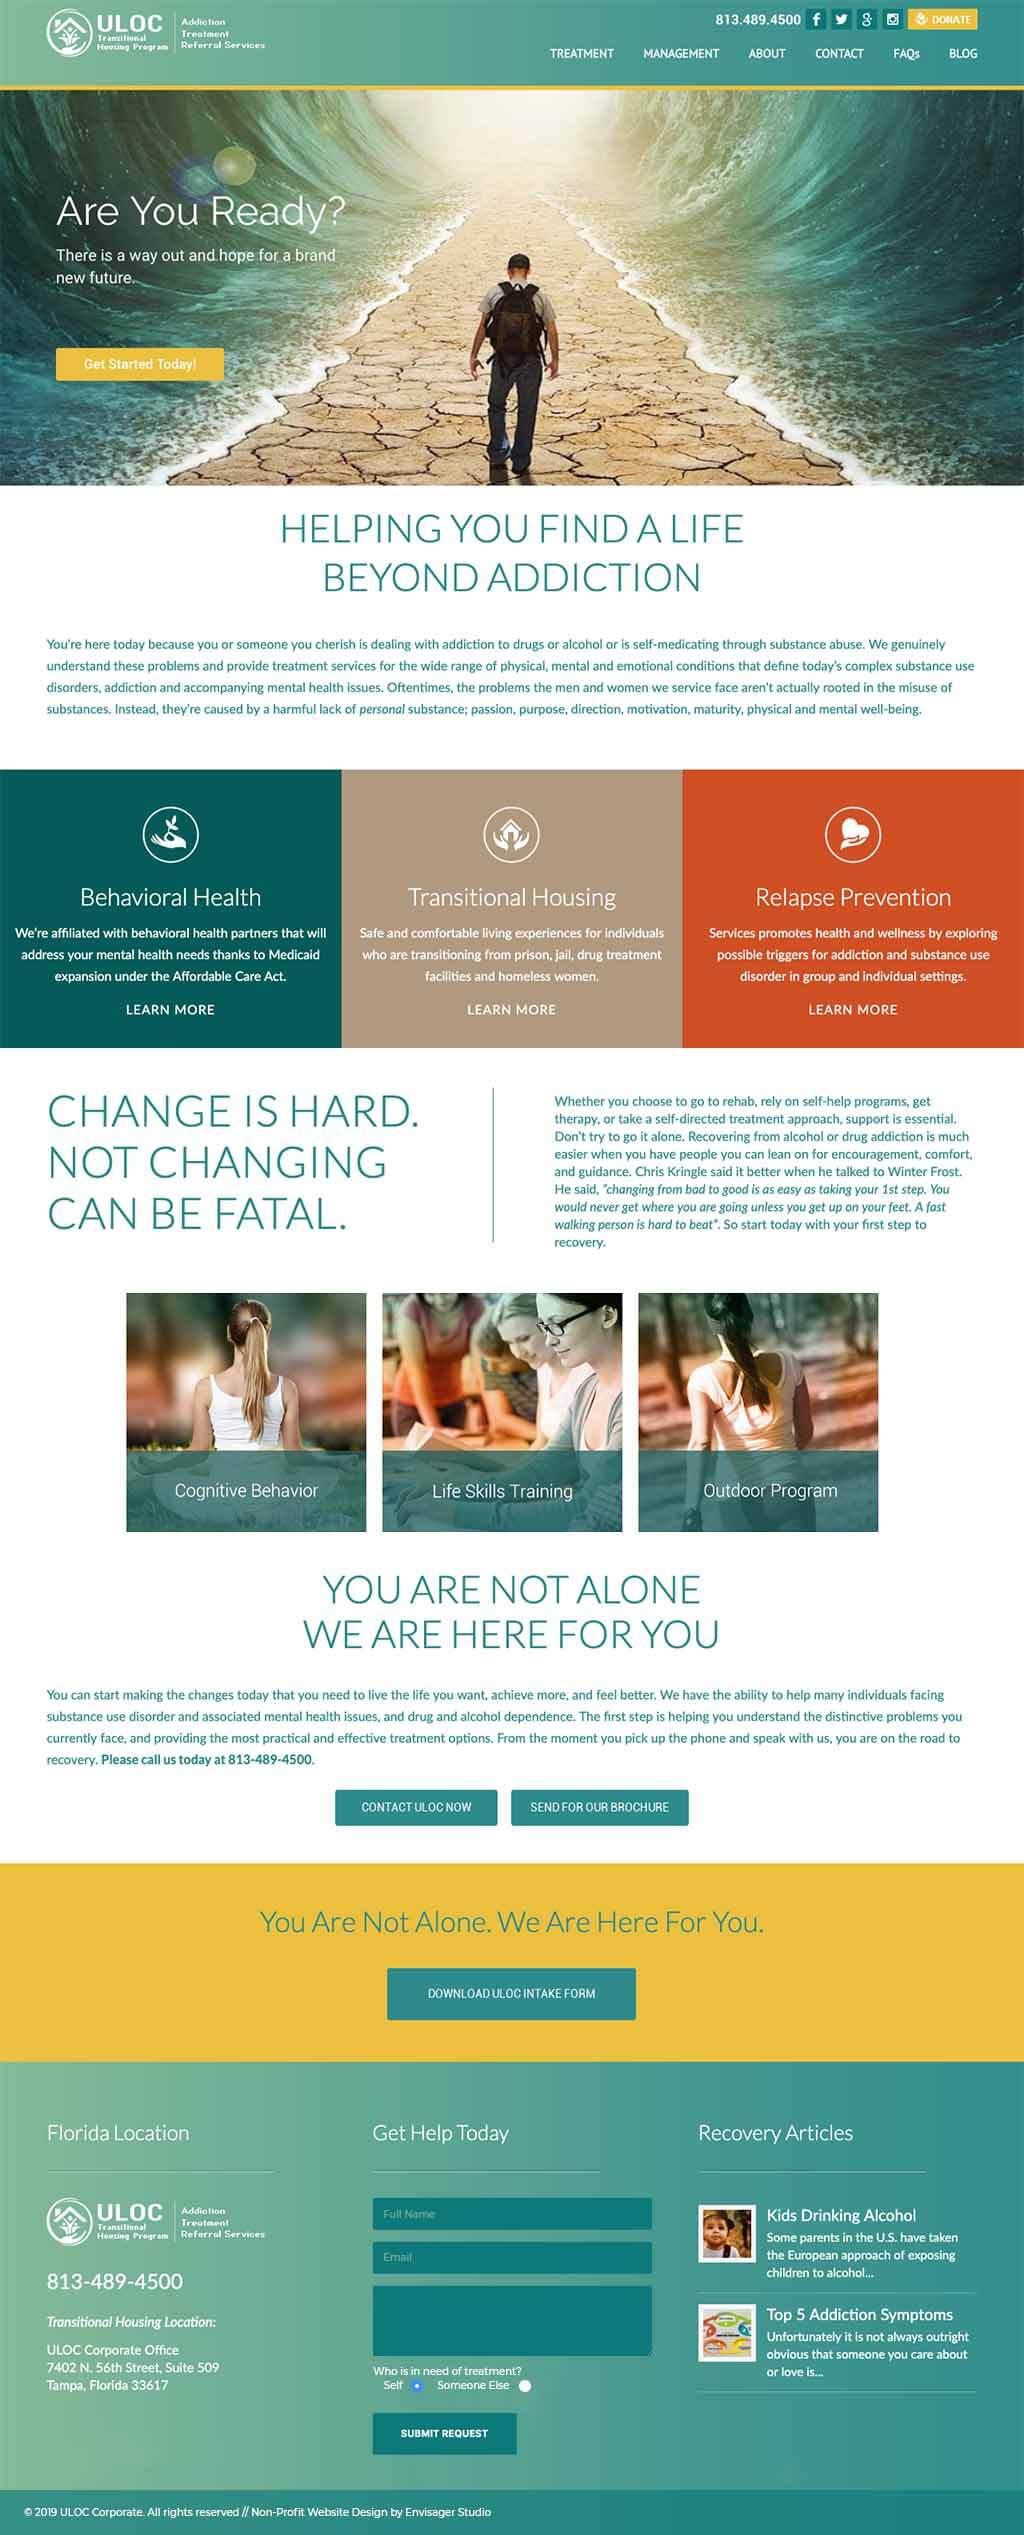 Website Design Substance Abuse Referral Services